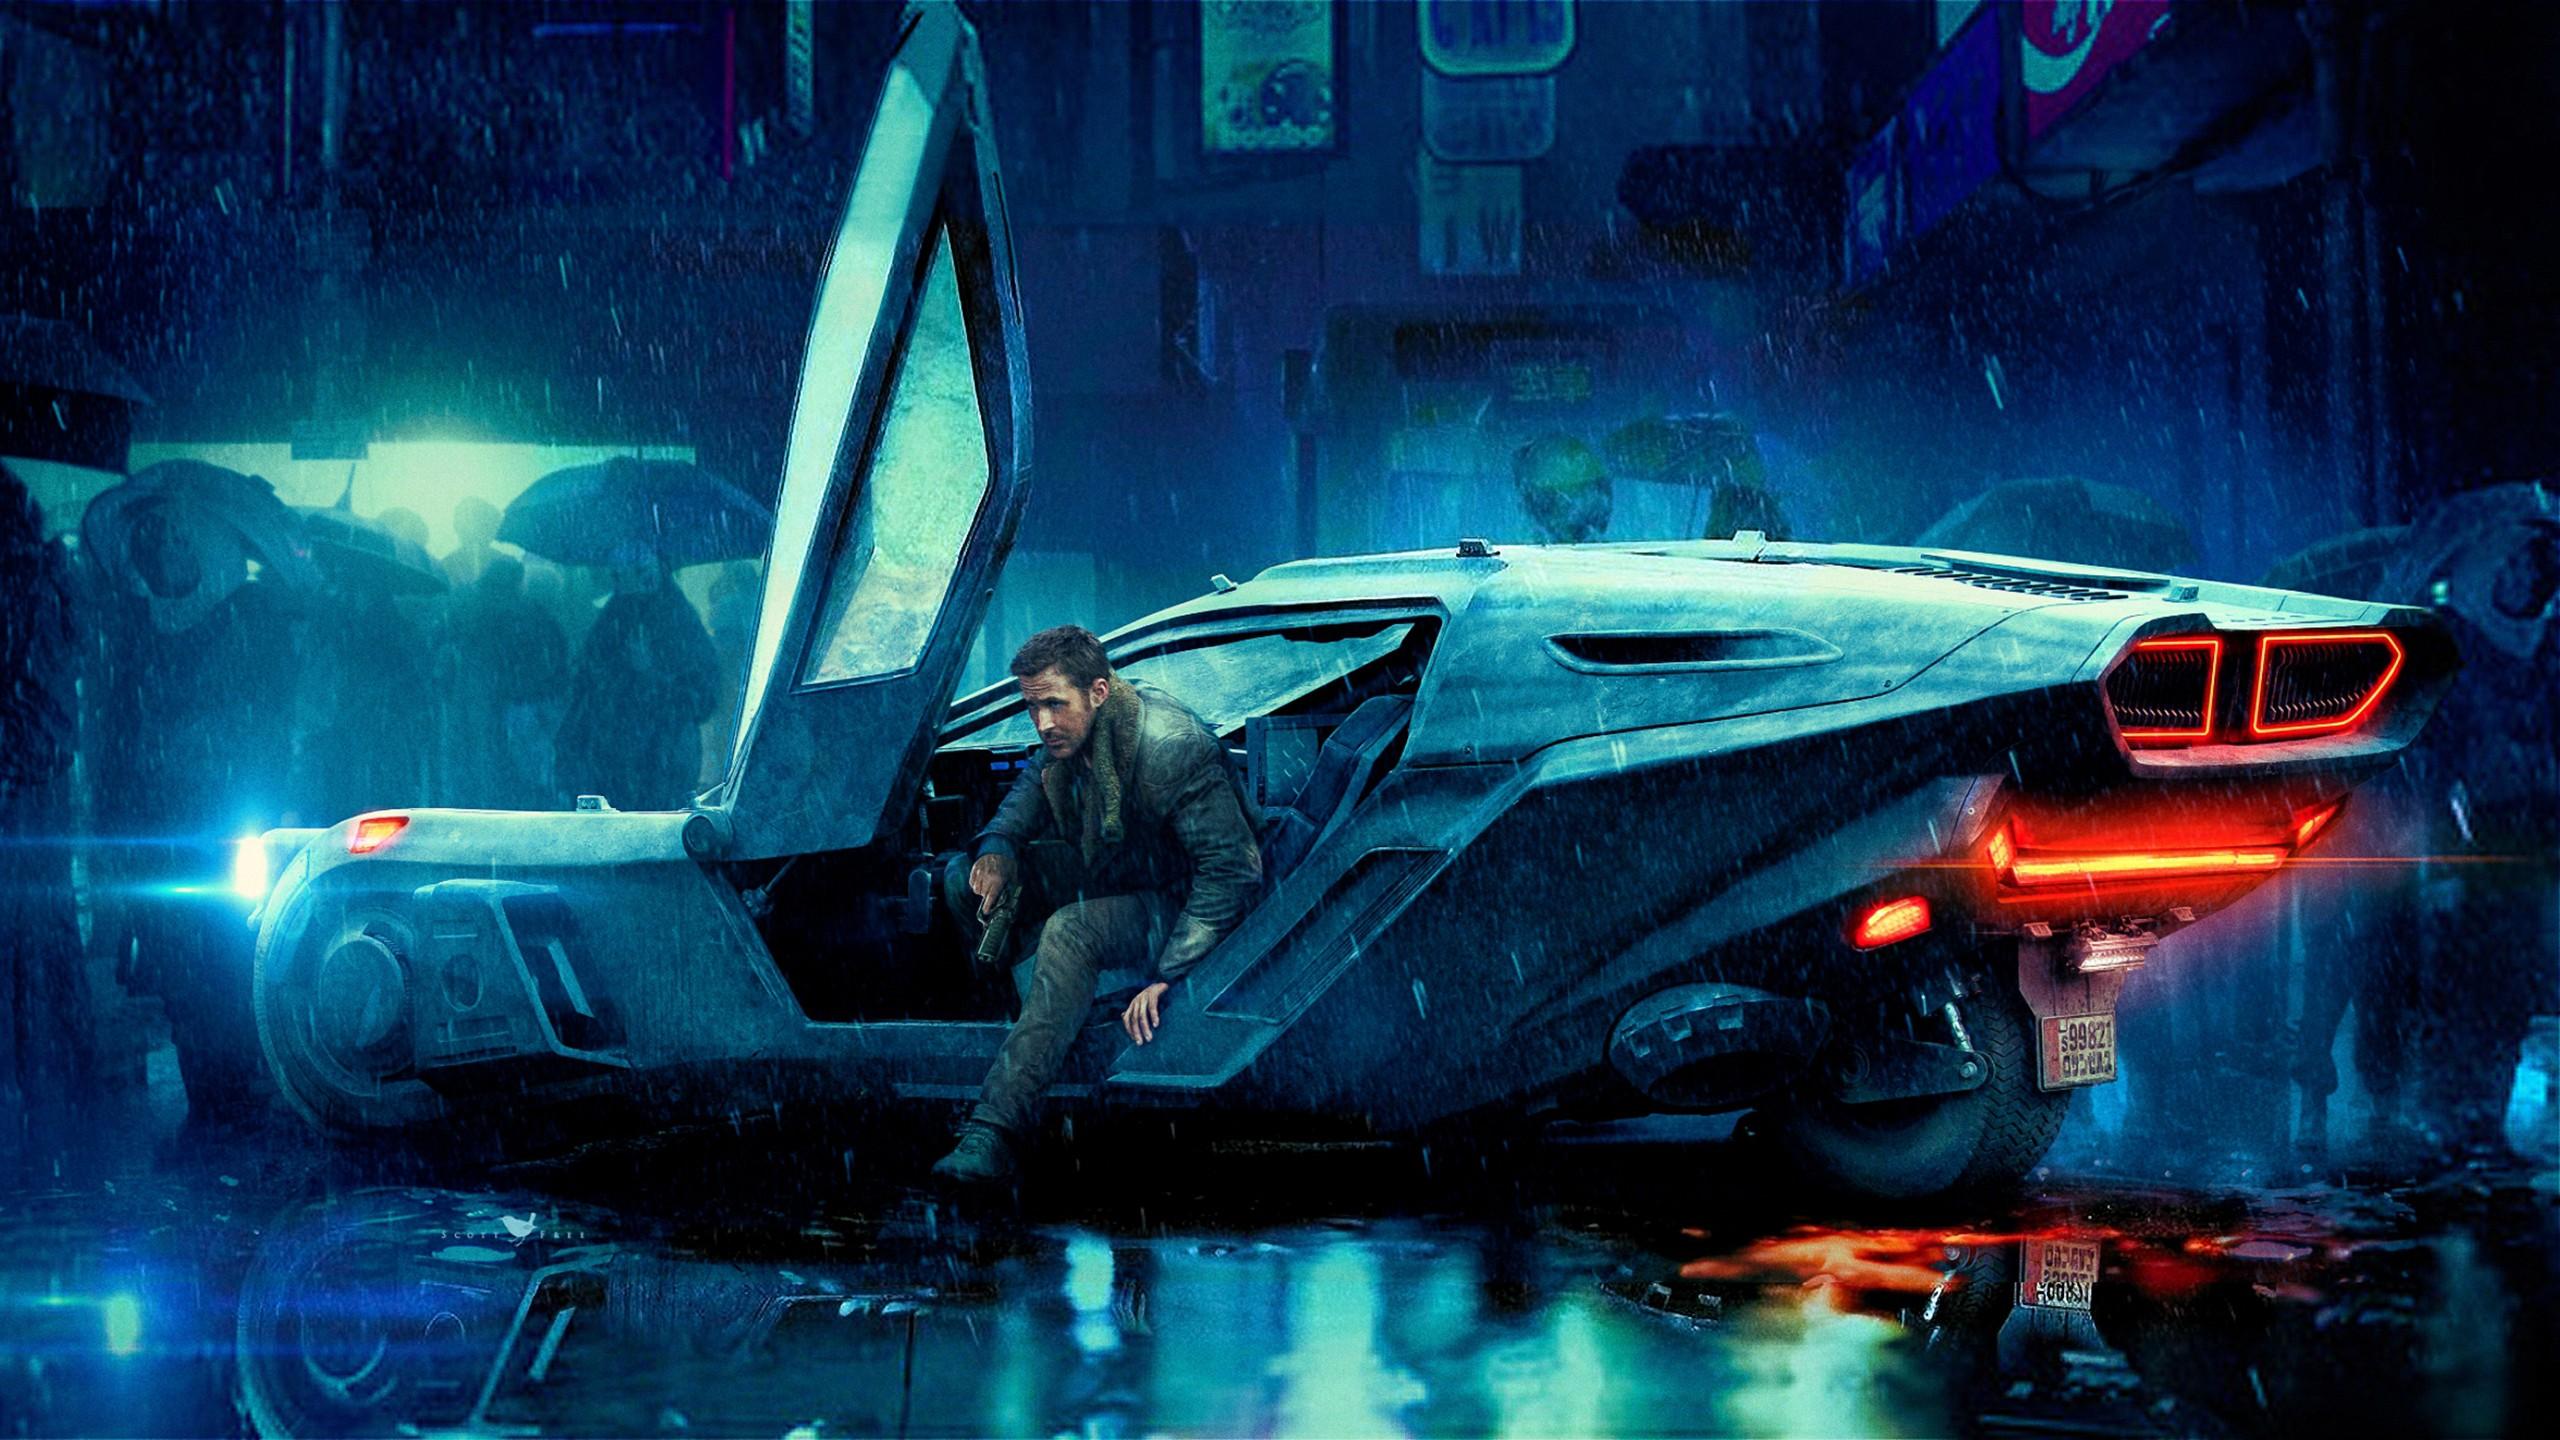 Hd Motorcycle Wallpaper Widescreen Blade Runner 2049 Wallpapers Hd Wallpapers Id 25193